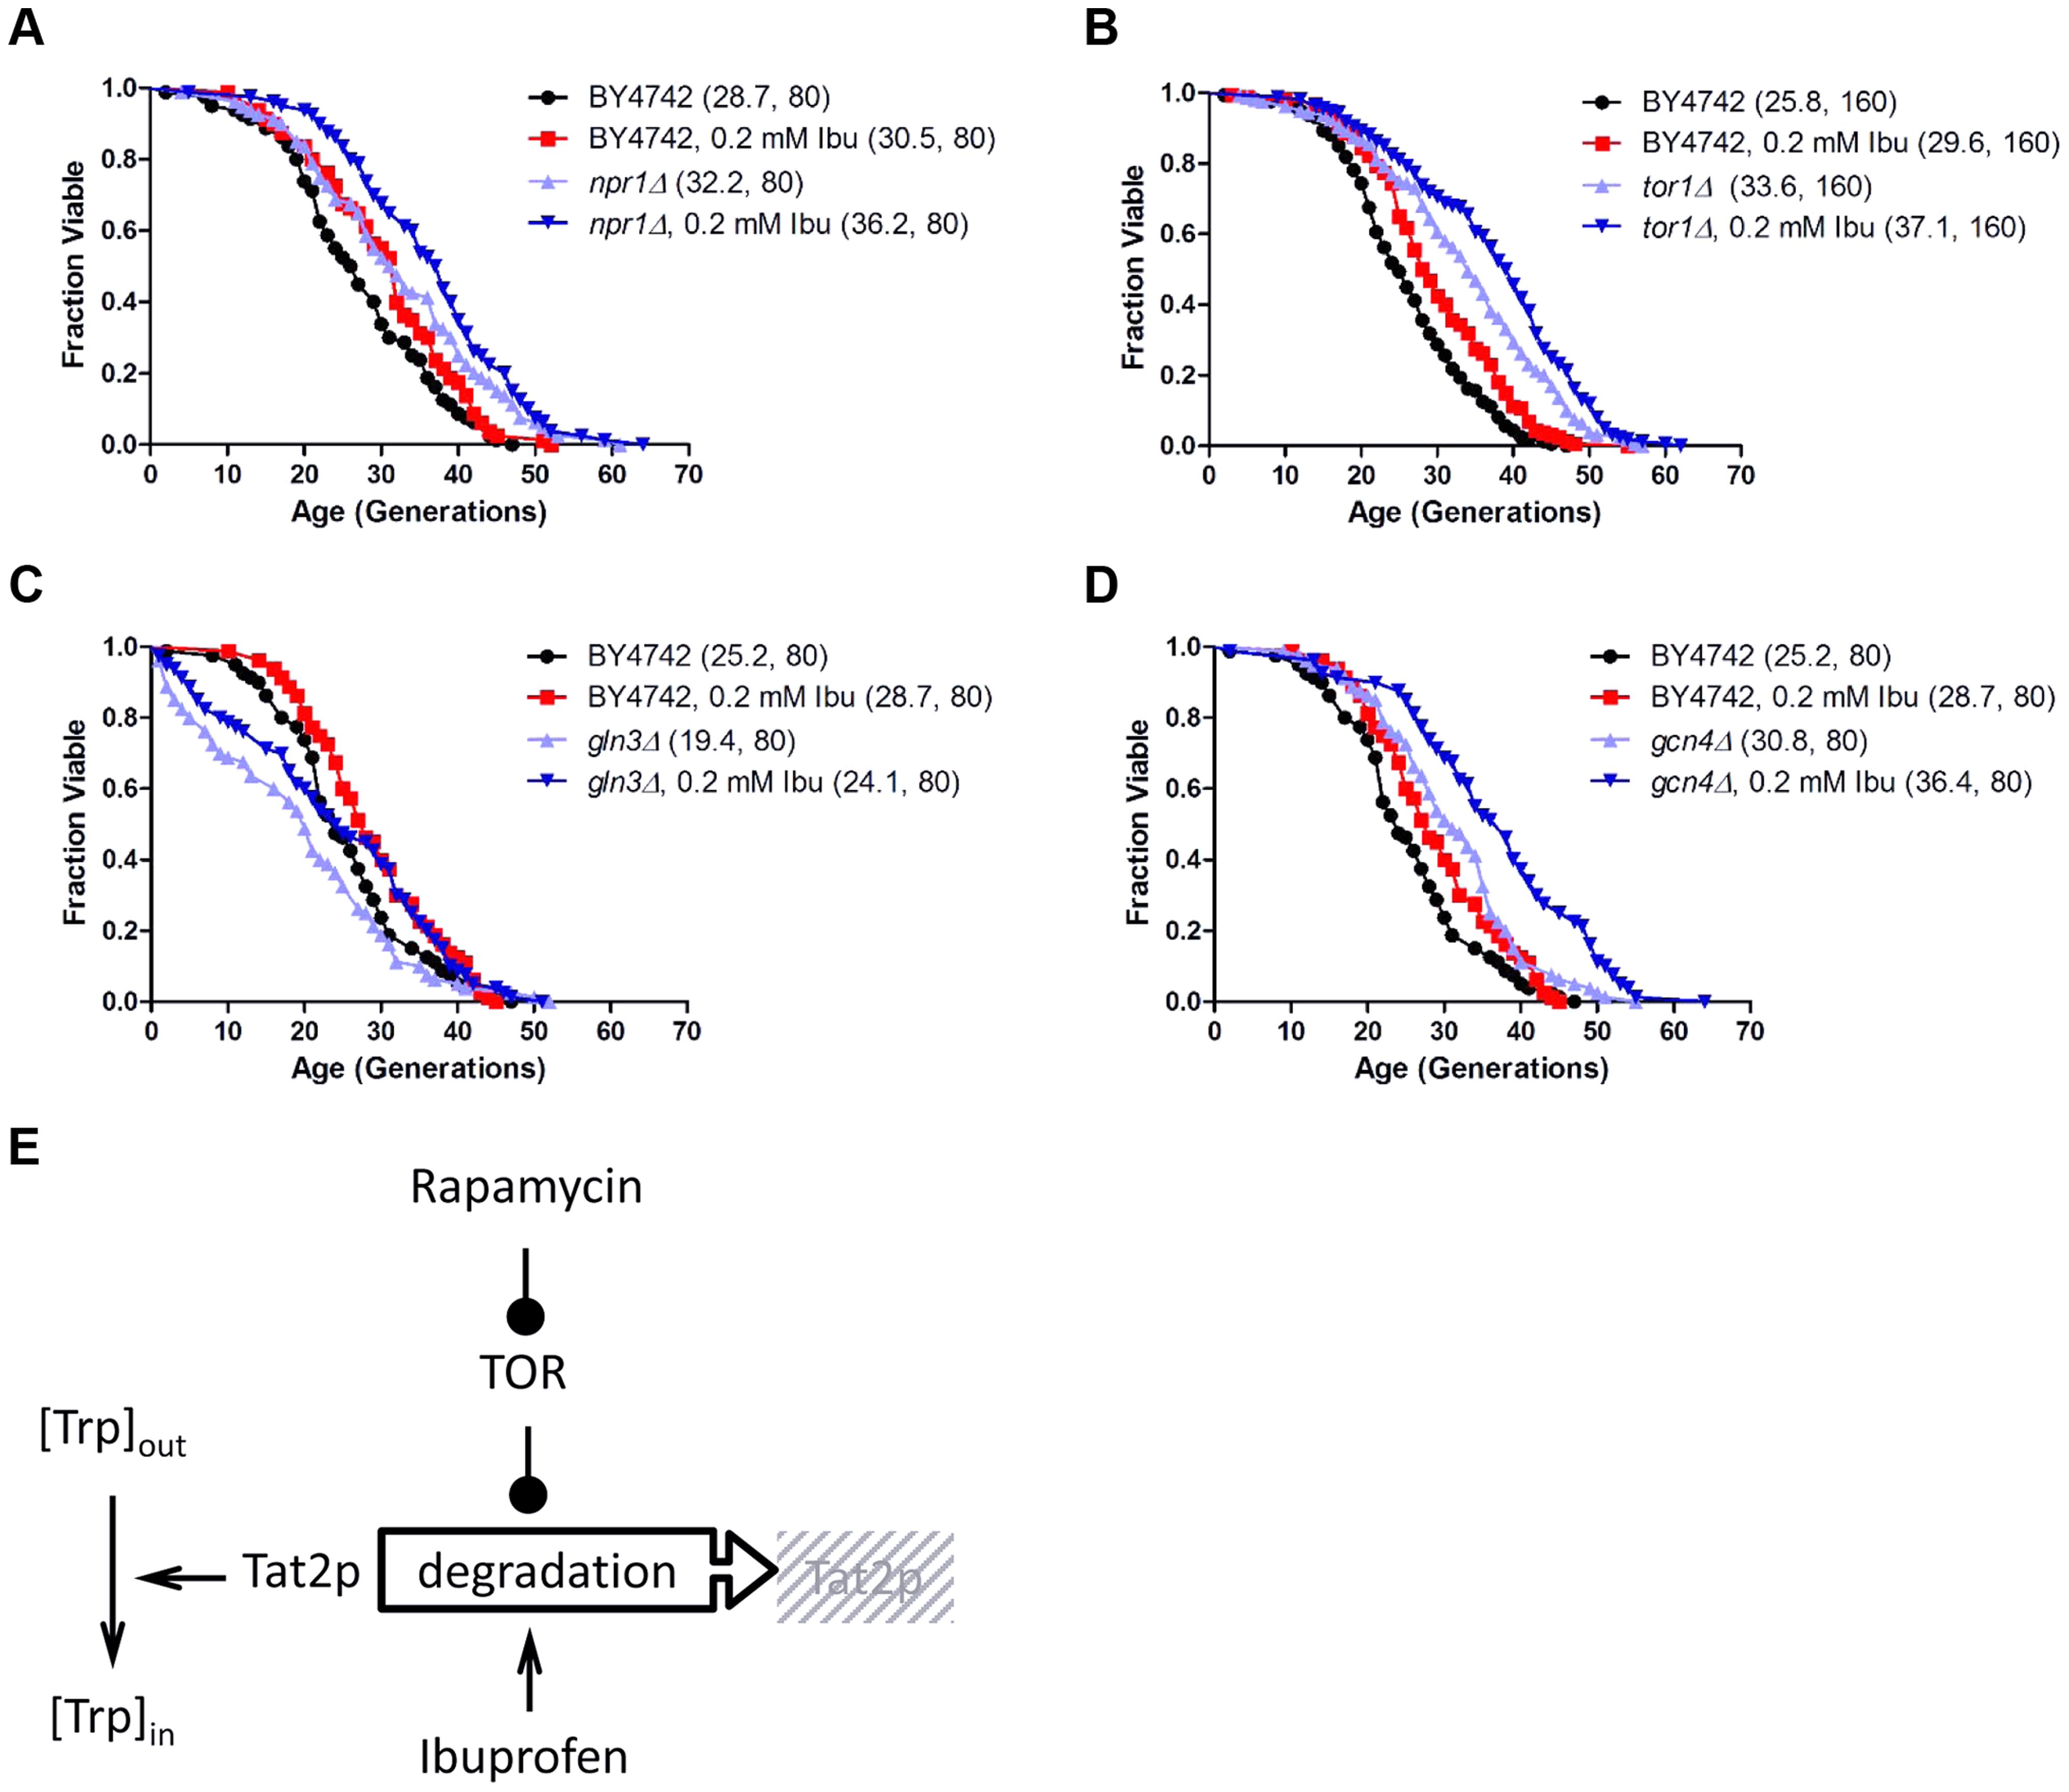 Ibuprofen extends RLS of TOR pathway mutants.